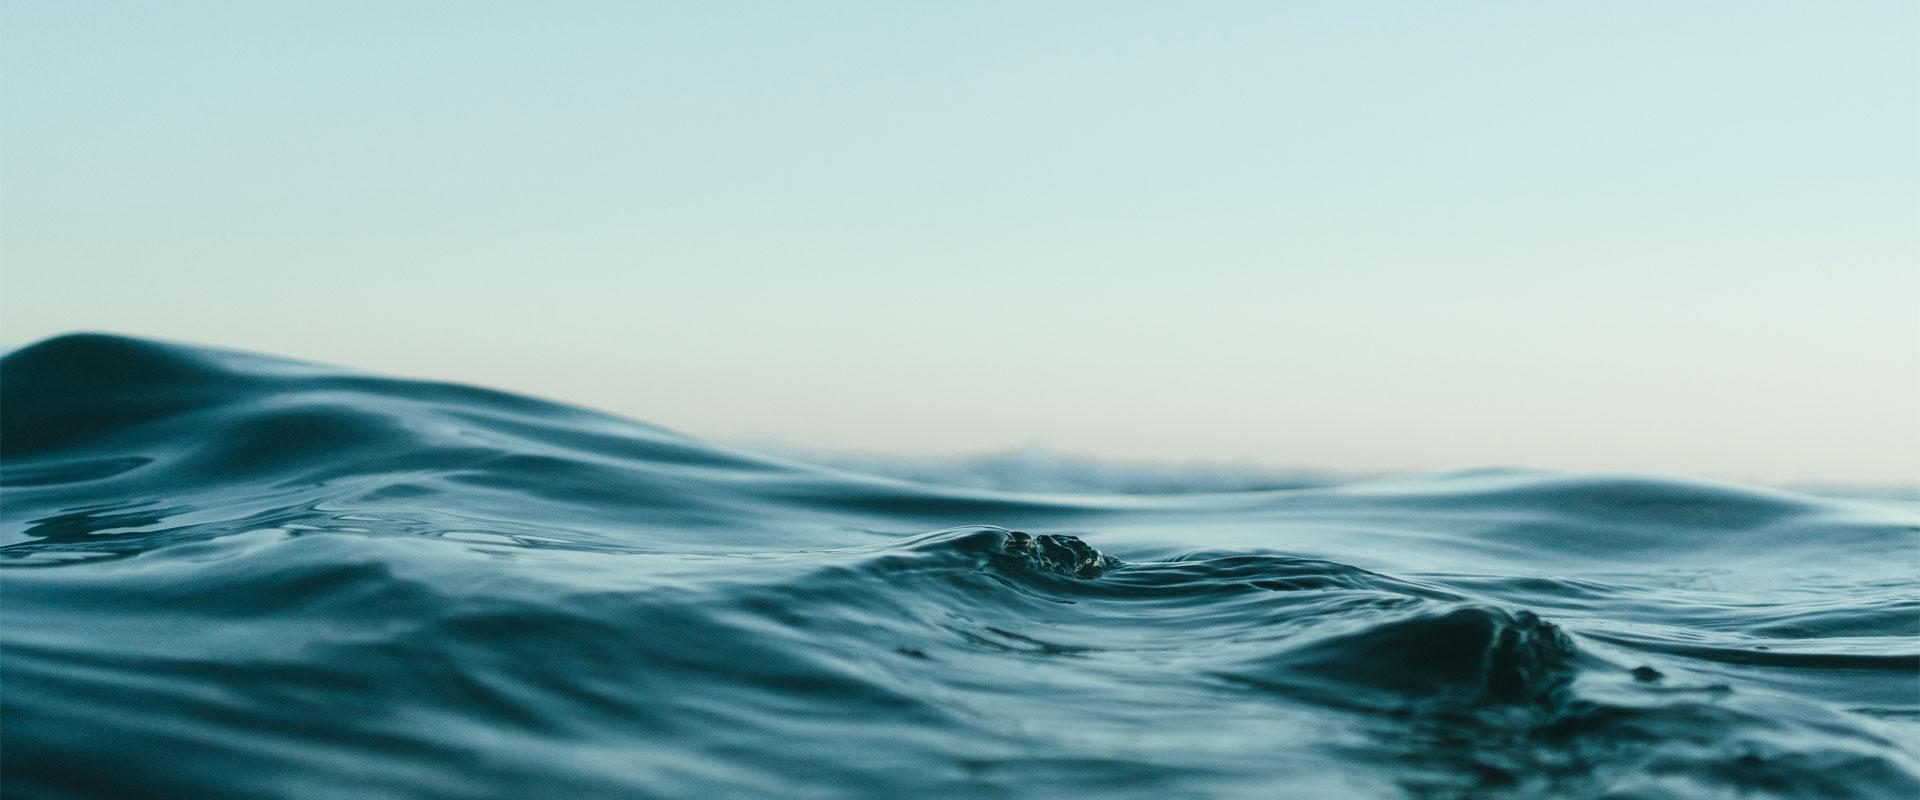 love-kingston-waves-2